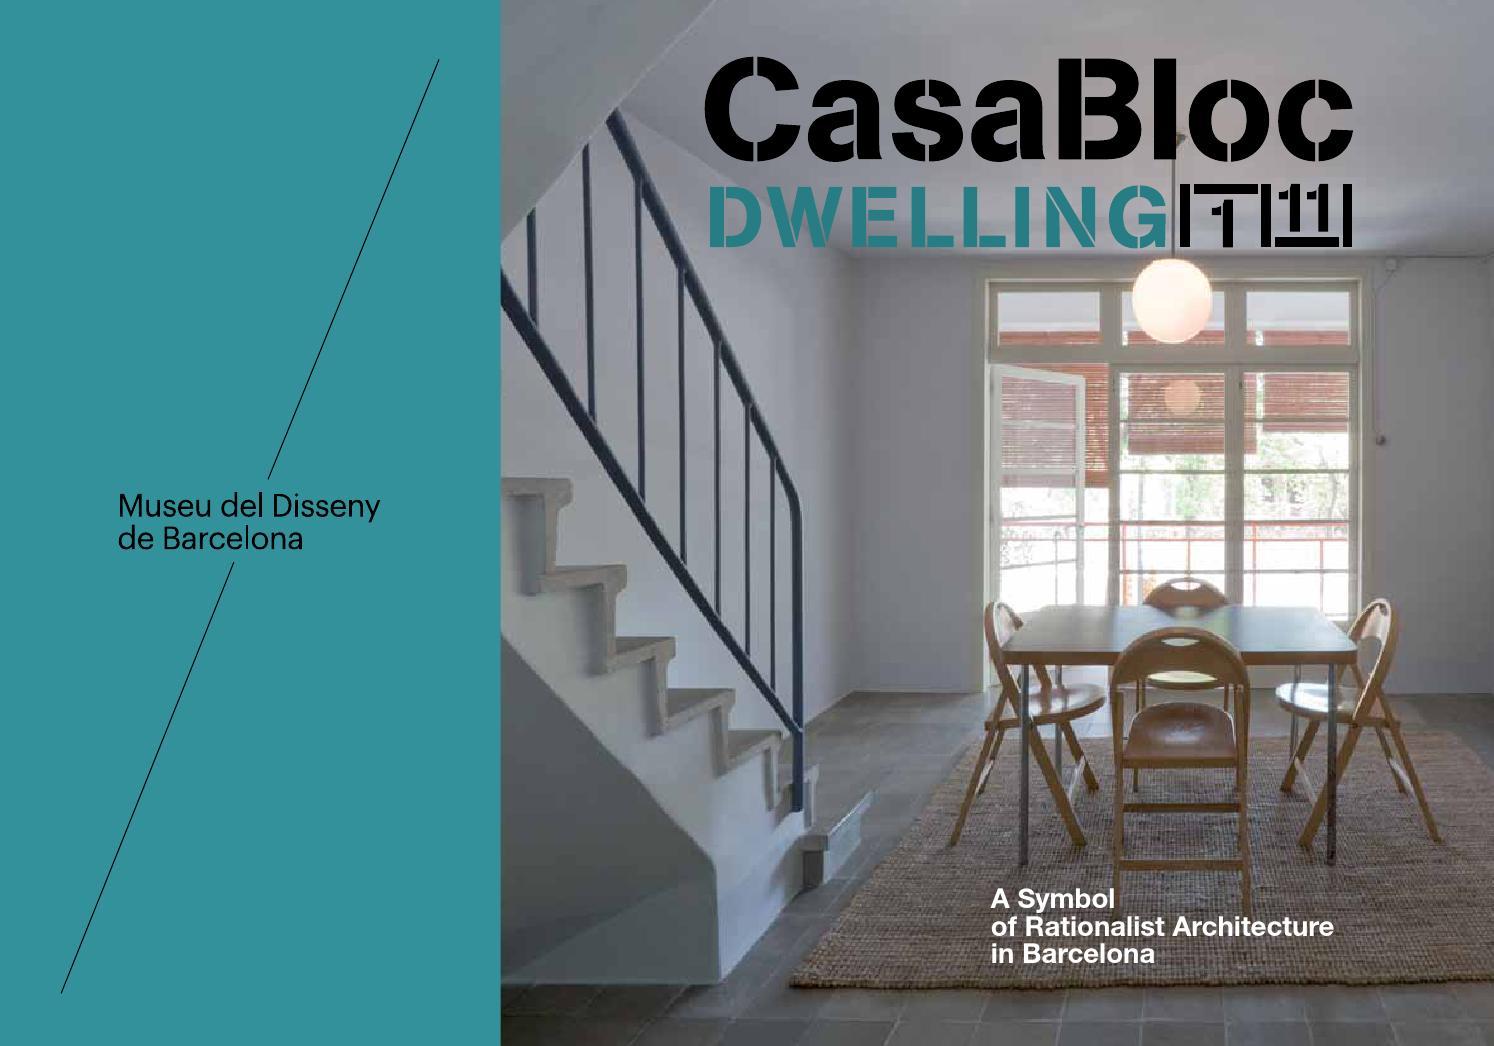 Archi In Casa Moderna brochure museum-apartment casa bloc, dwelling 1/11. museu